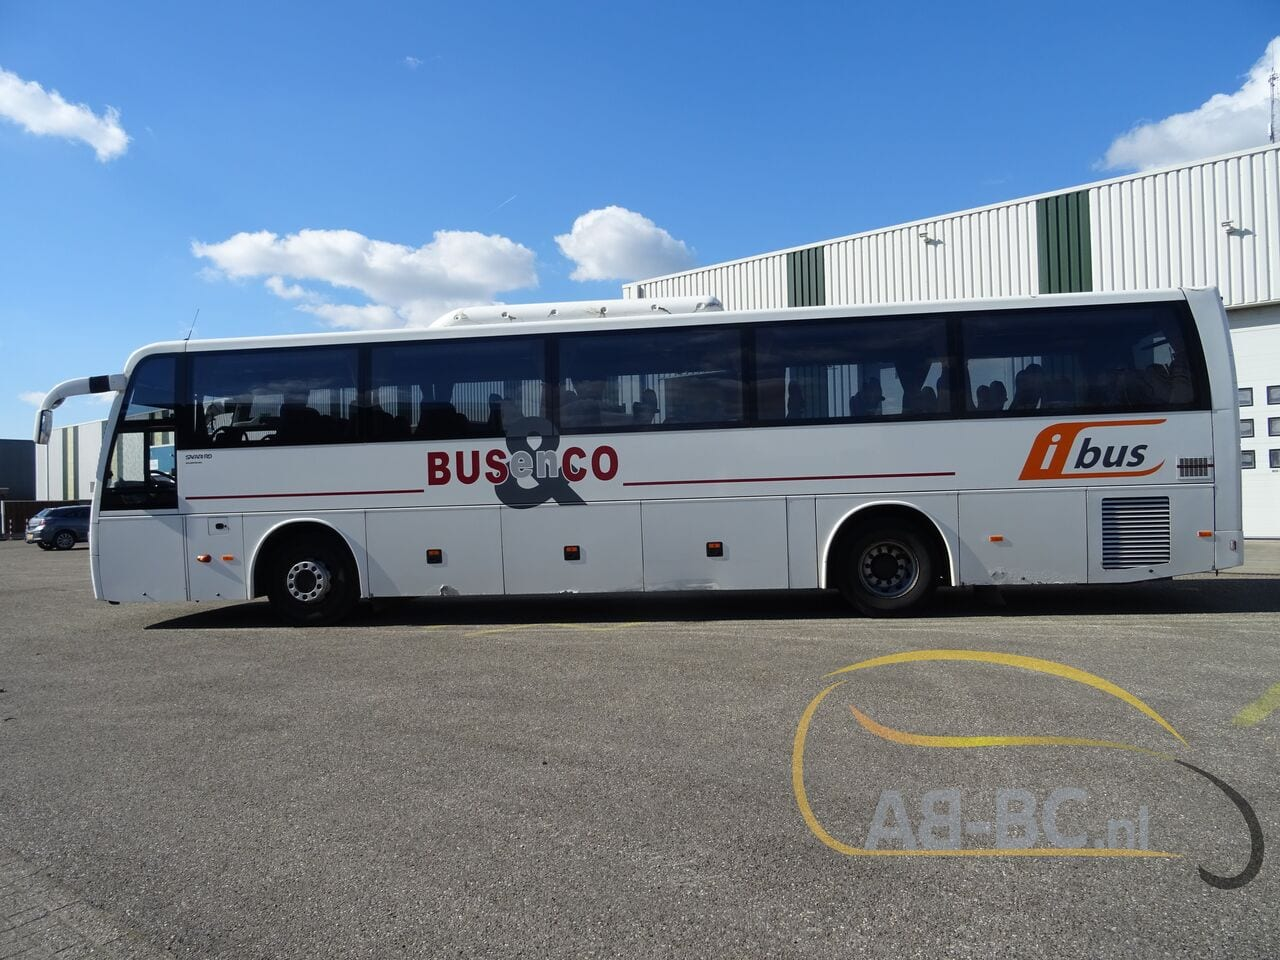 coach-busTEMSA-Safari-RD-53-Seats-DAF-Motor-12-mtr---1616166622637738617_big_acfd6f536da8925fbb86e19e69ed6db0--21031917053743807500